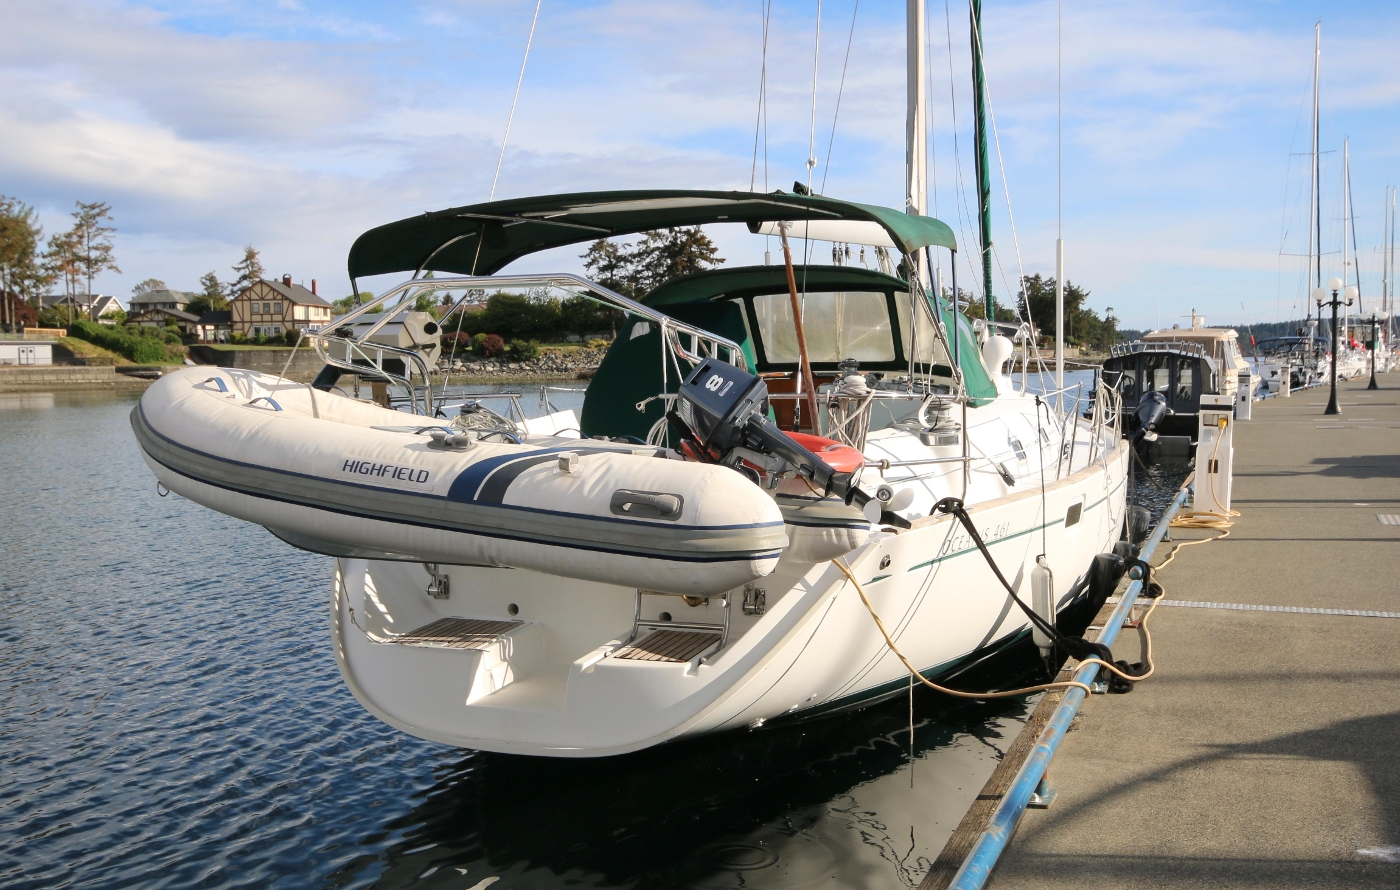 1997 Beneteau Oceanis 461, West Wind on our docks